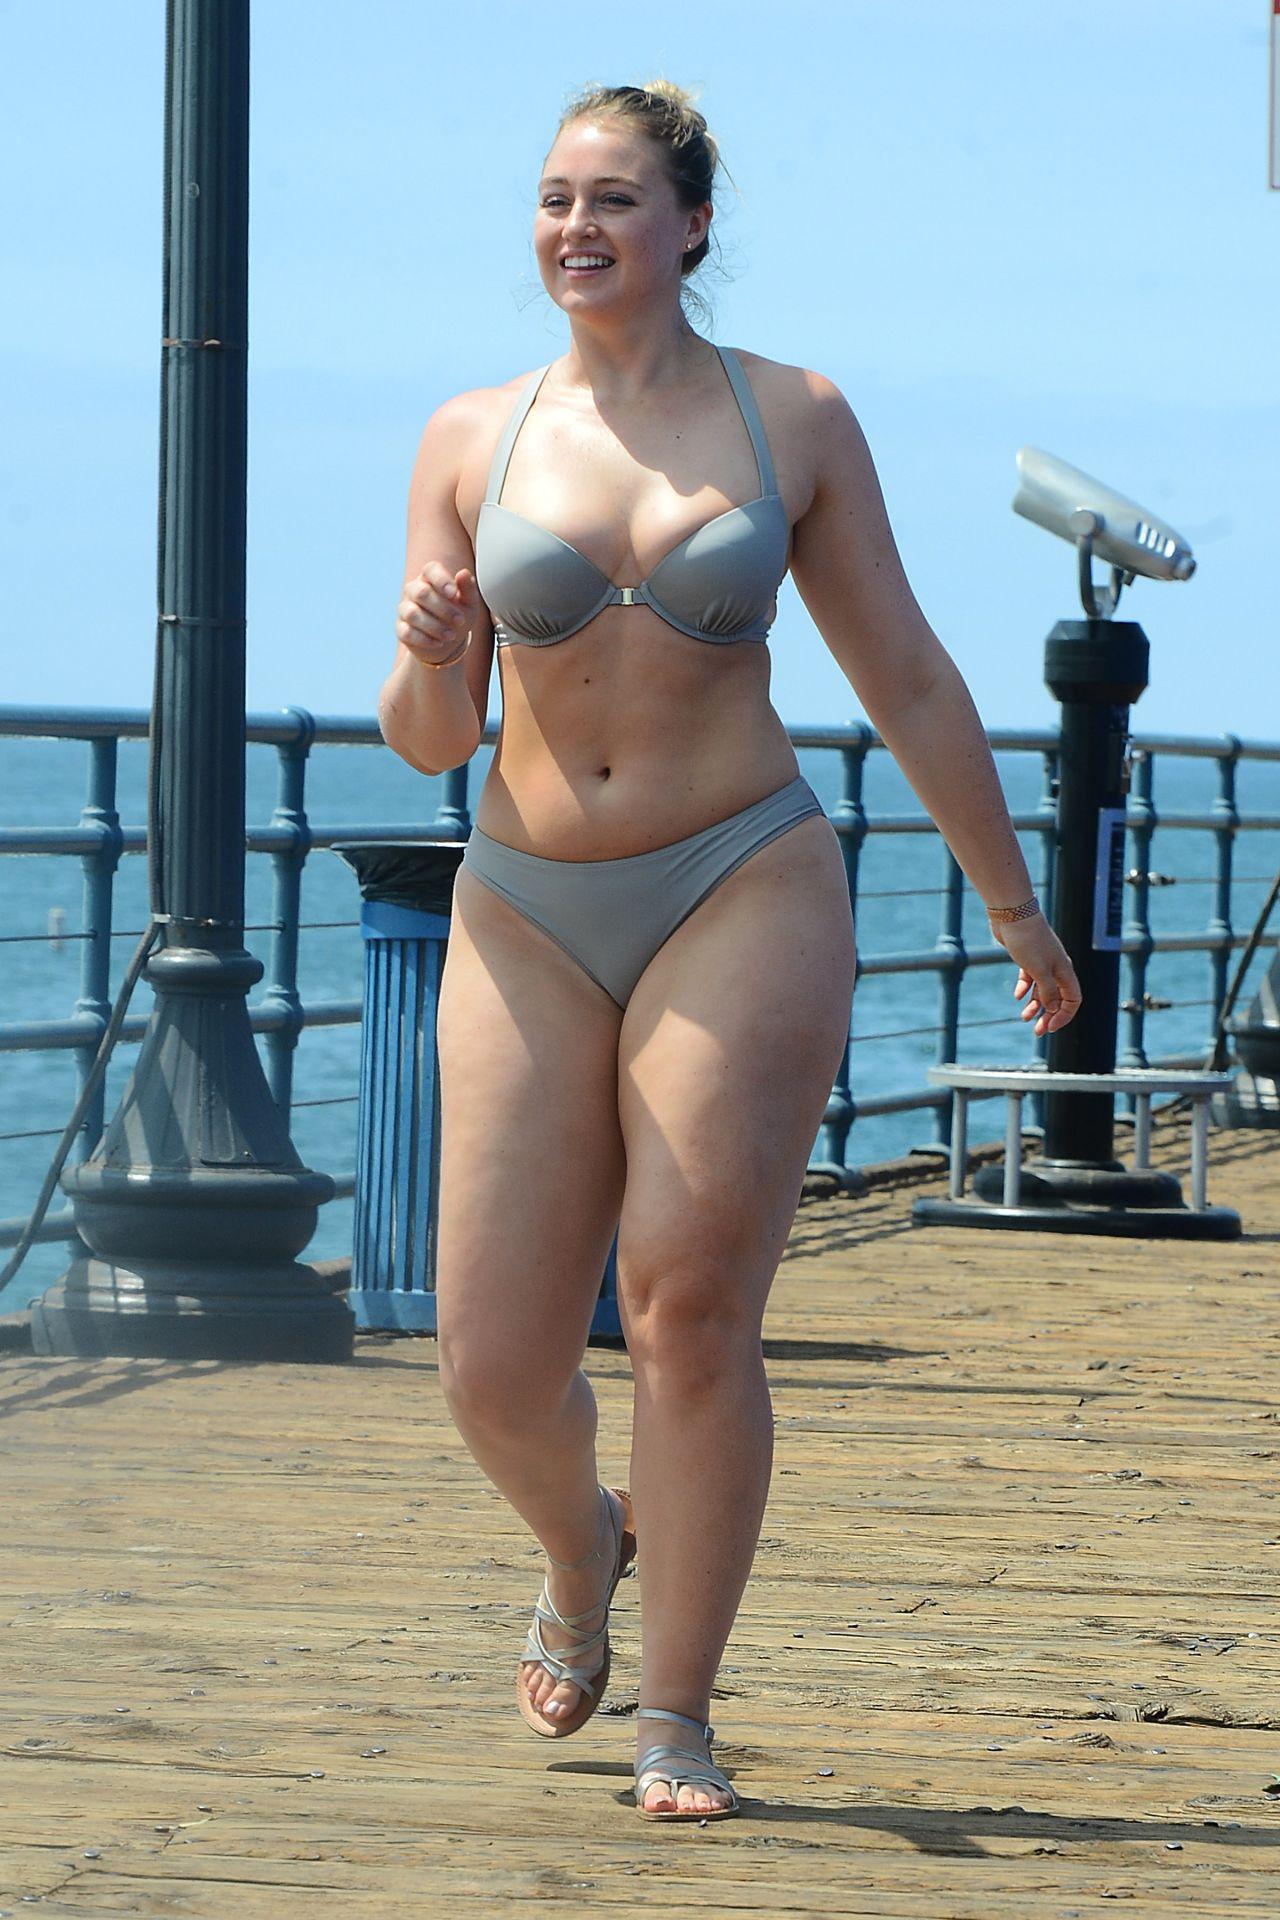 Iskra Lawrence in Bikini - Photoshoot For Her Website